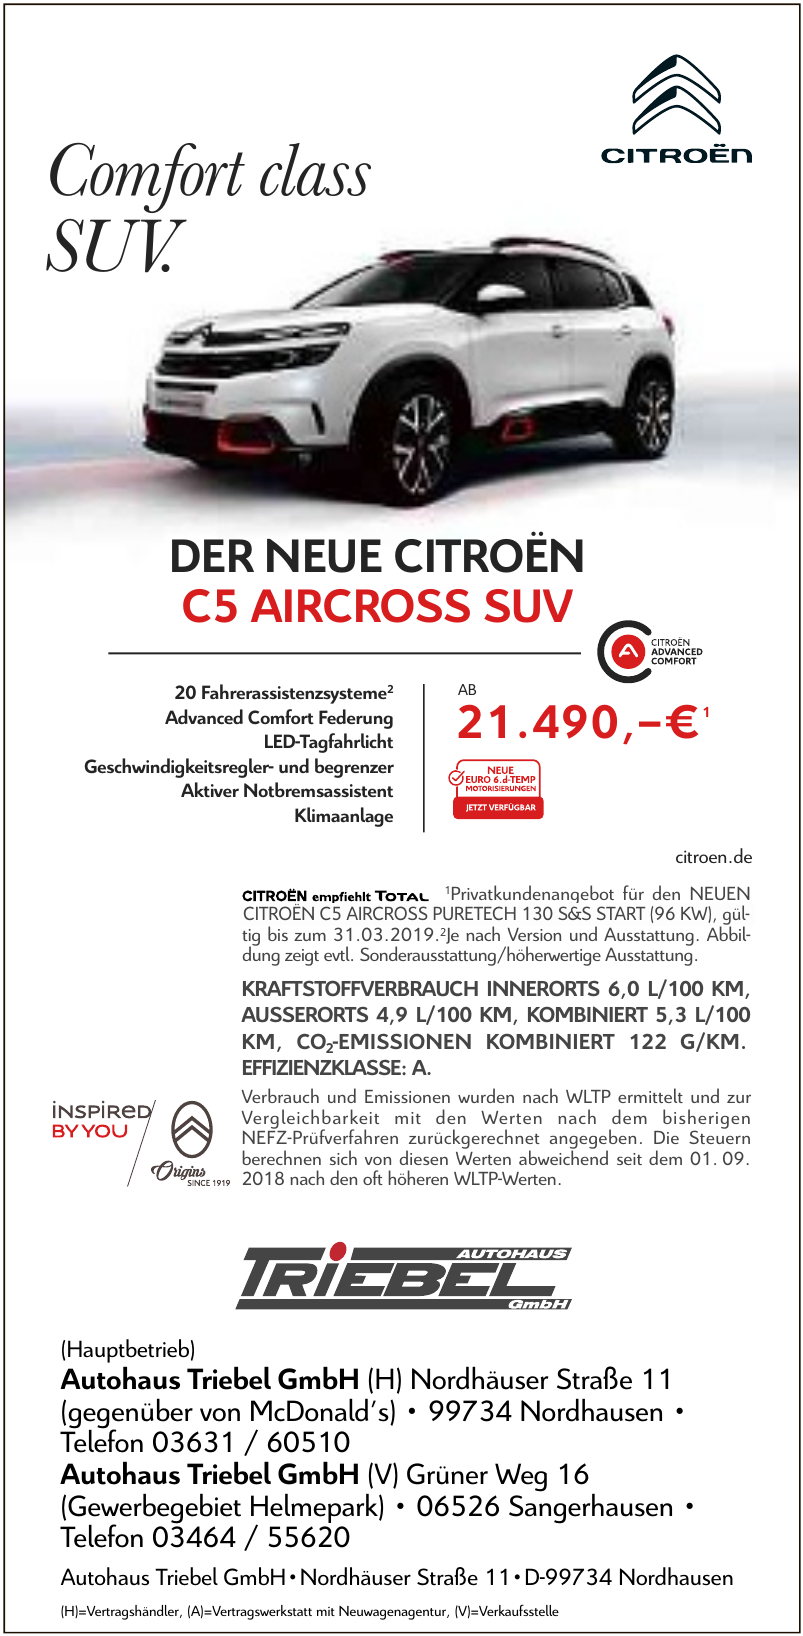 Autohaus Triebel GmbH